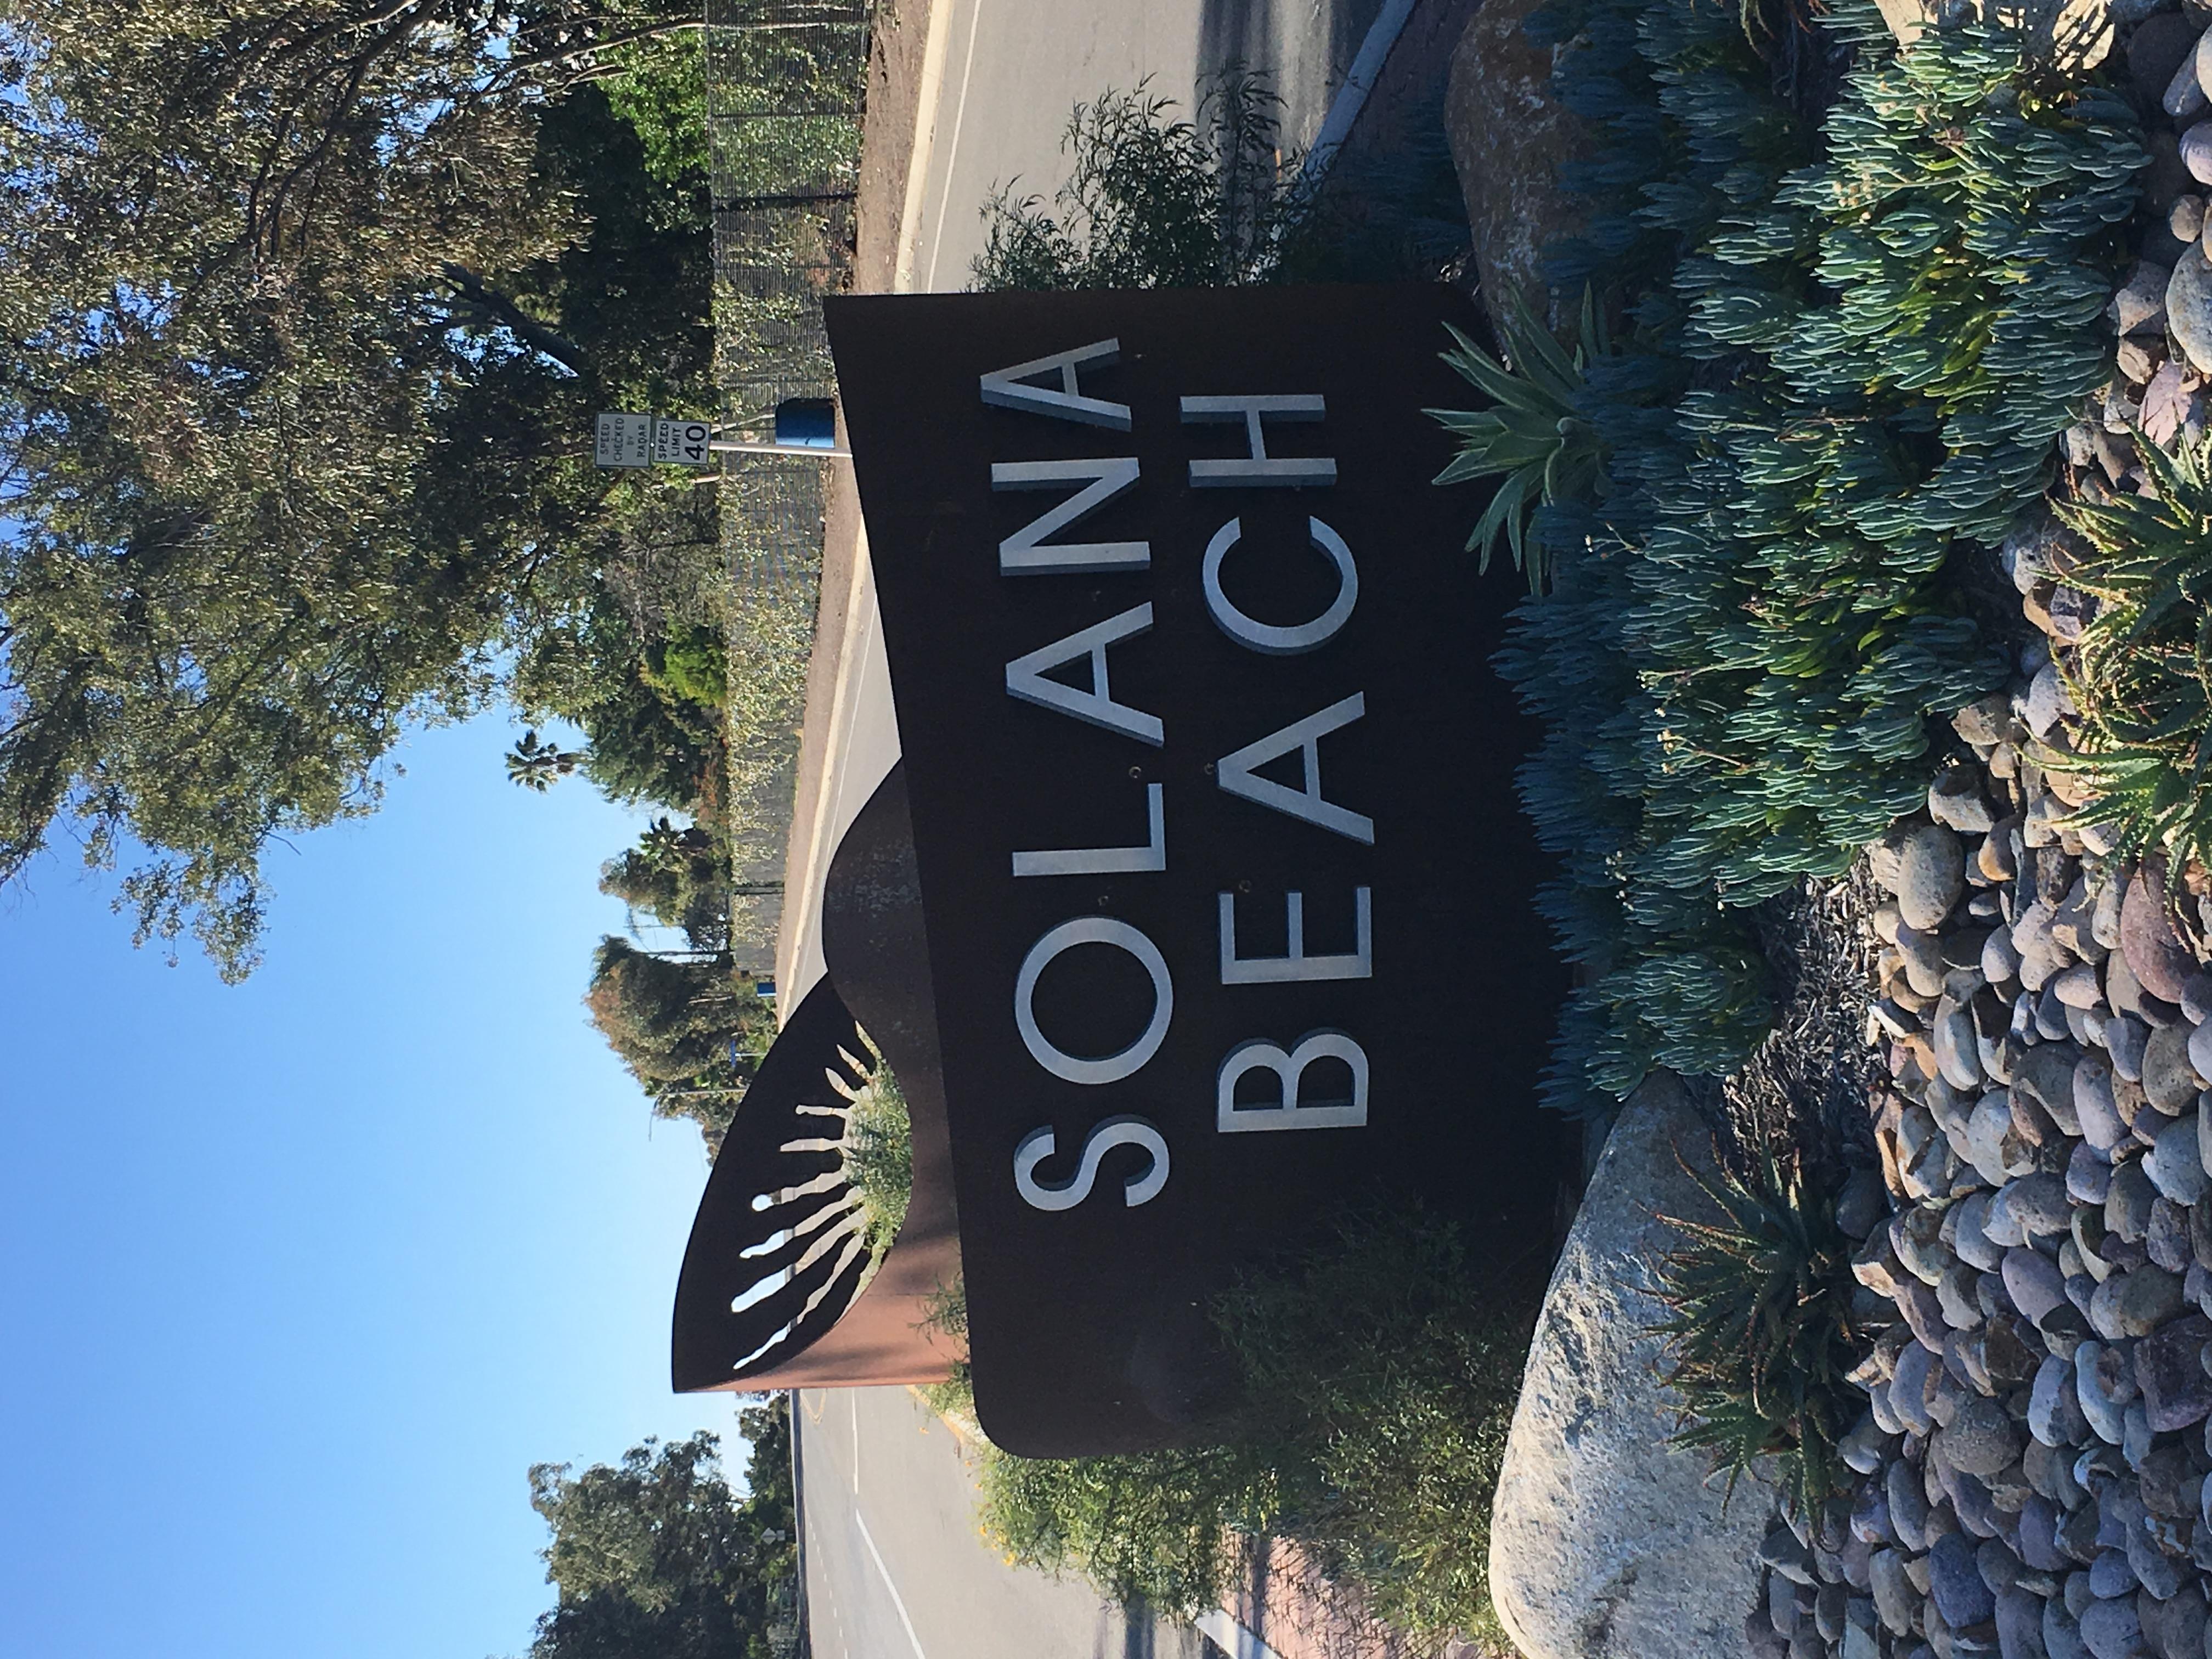 SolanaBeachSign